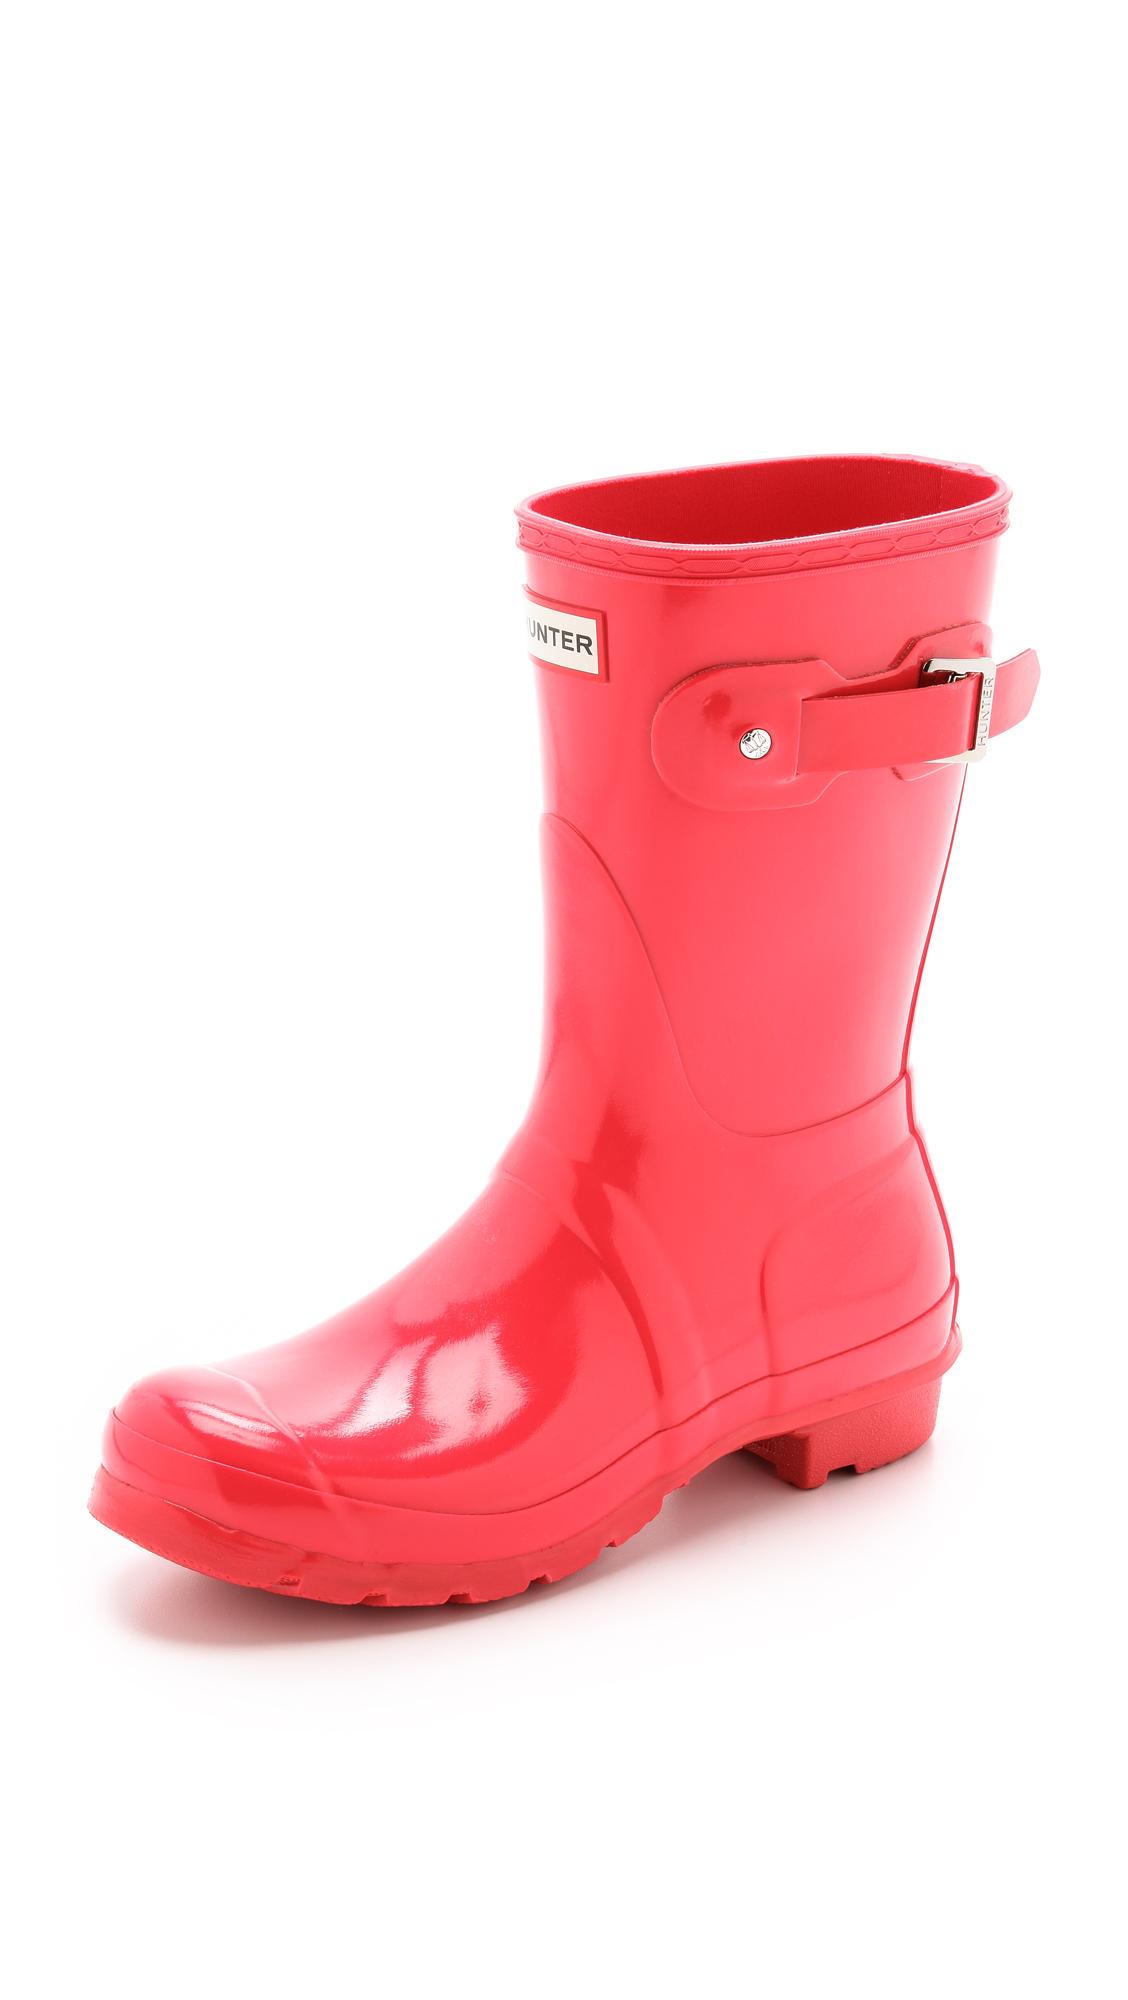 HUNTER Original Short Gloss Boots - Bright Plum in Bright ...